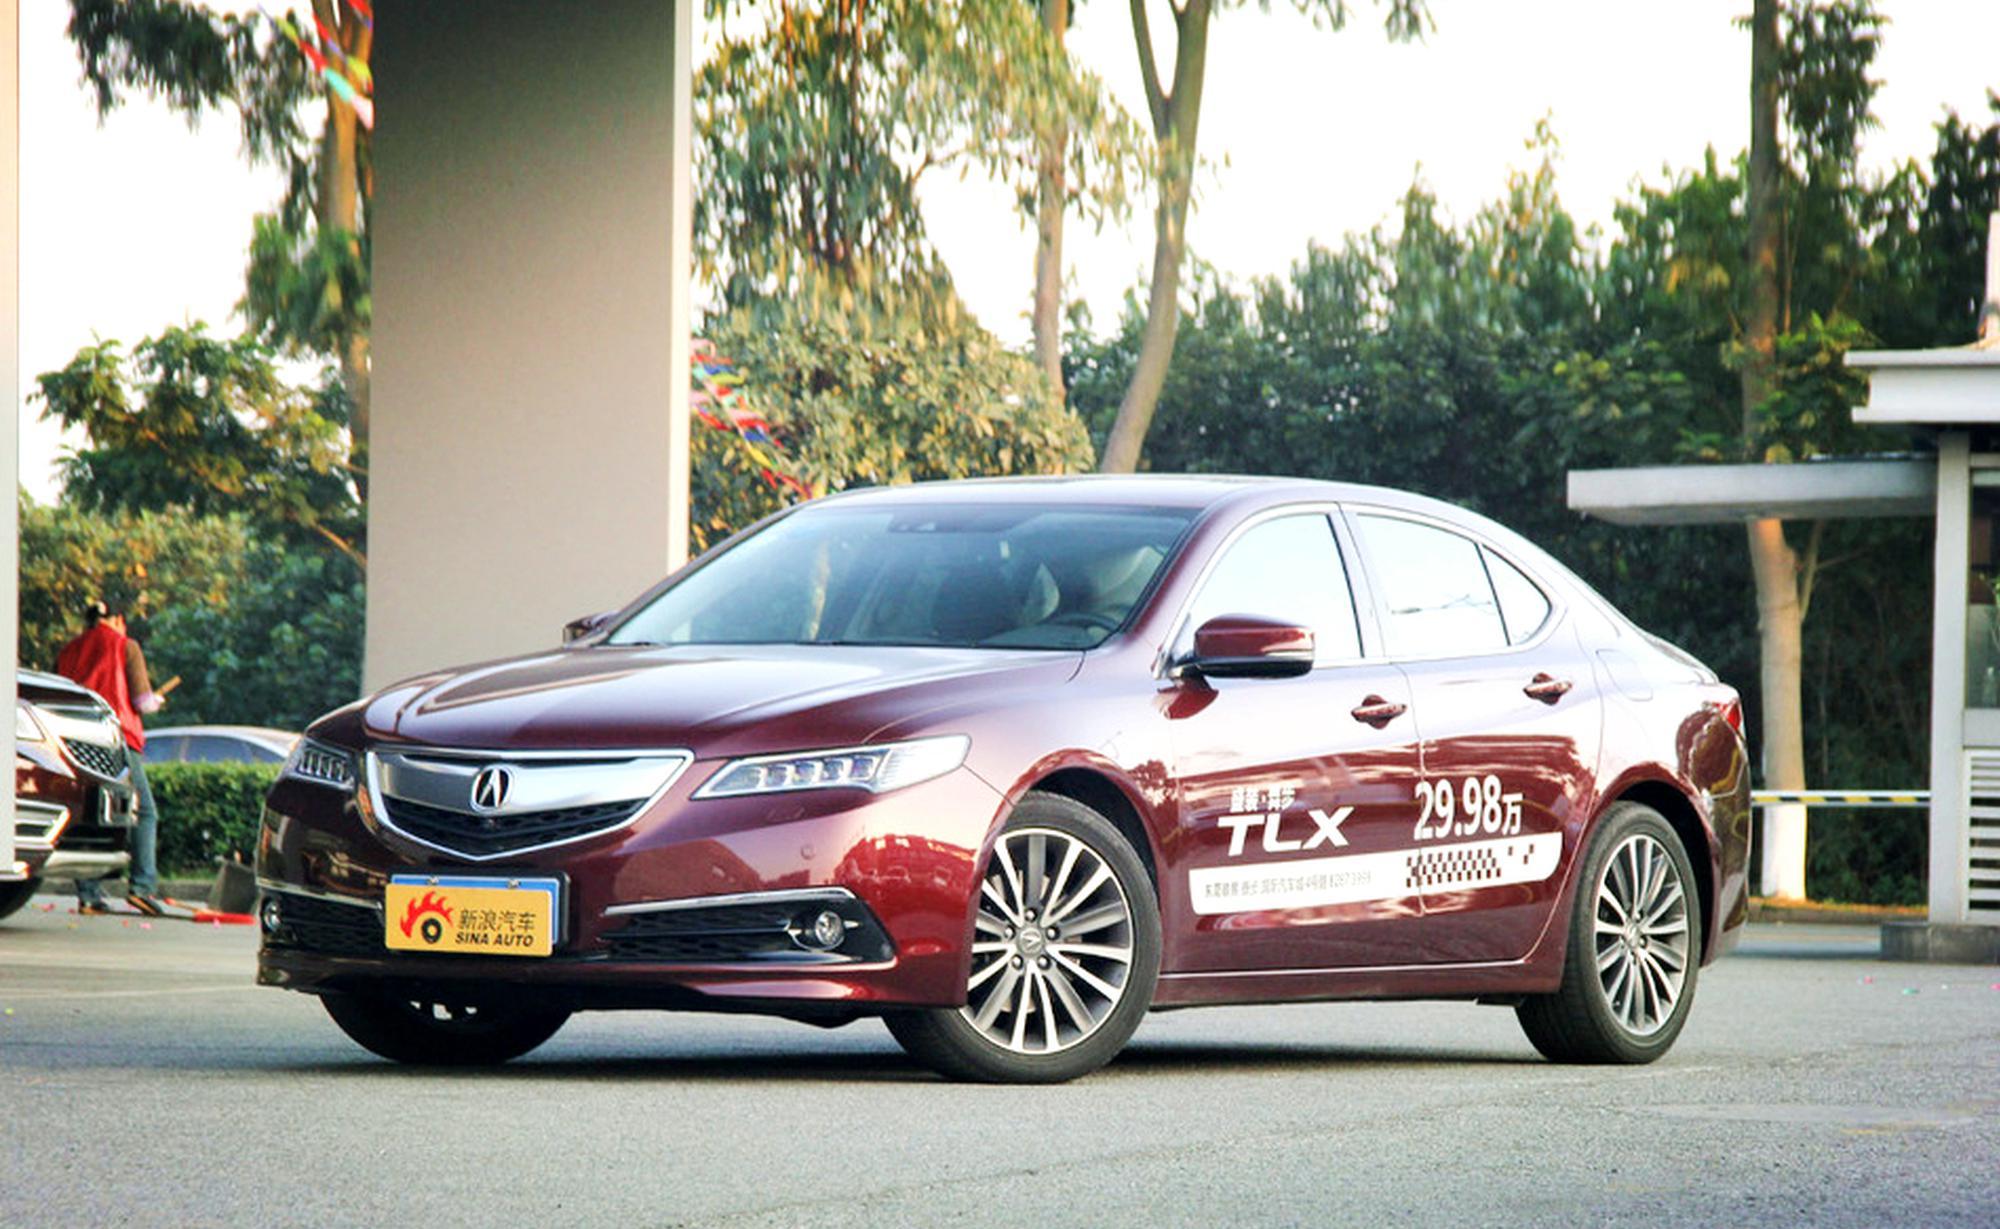 Acura讴歌金田店TLX-L 22.98万元起